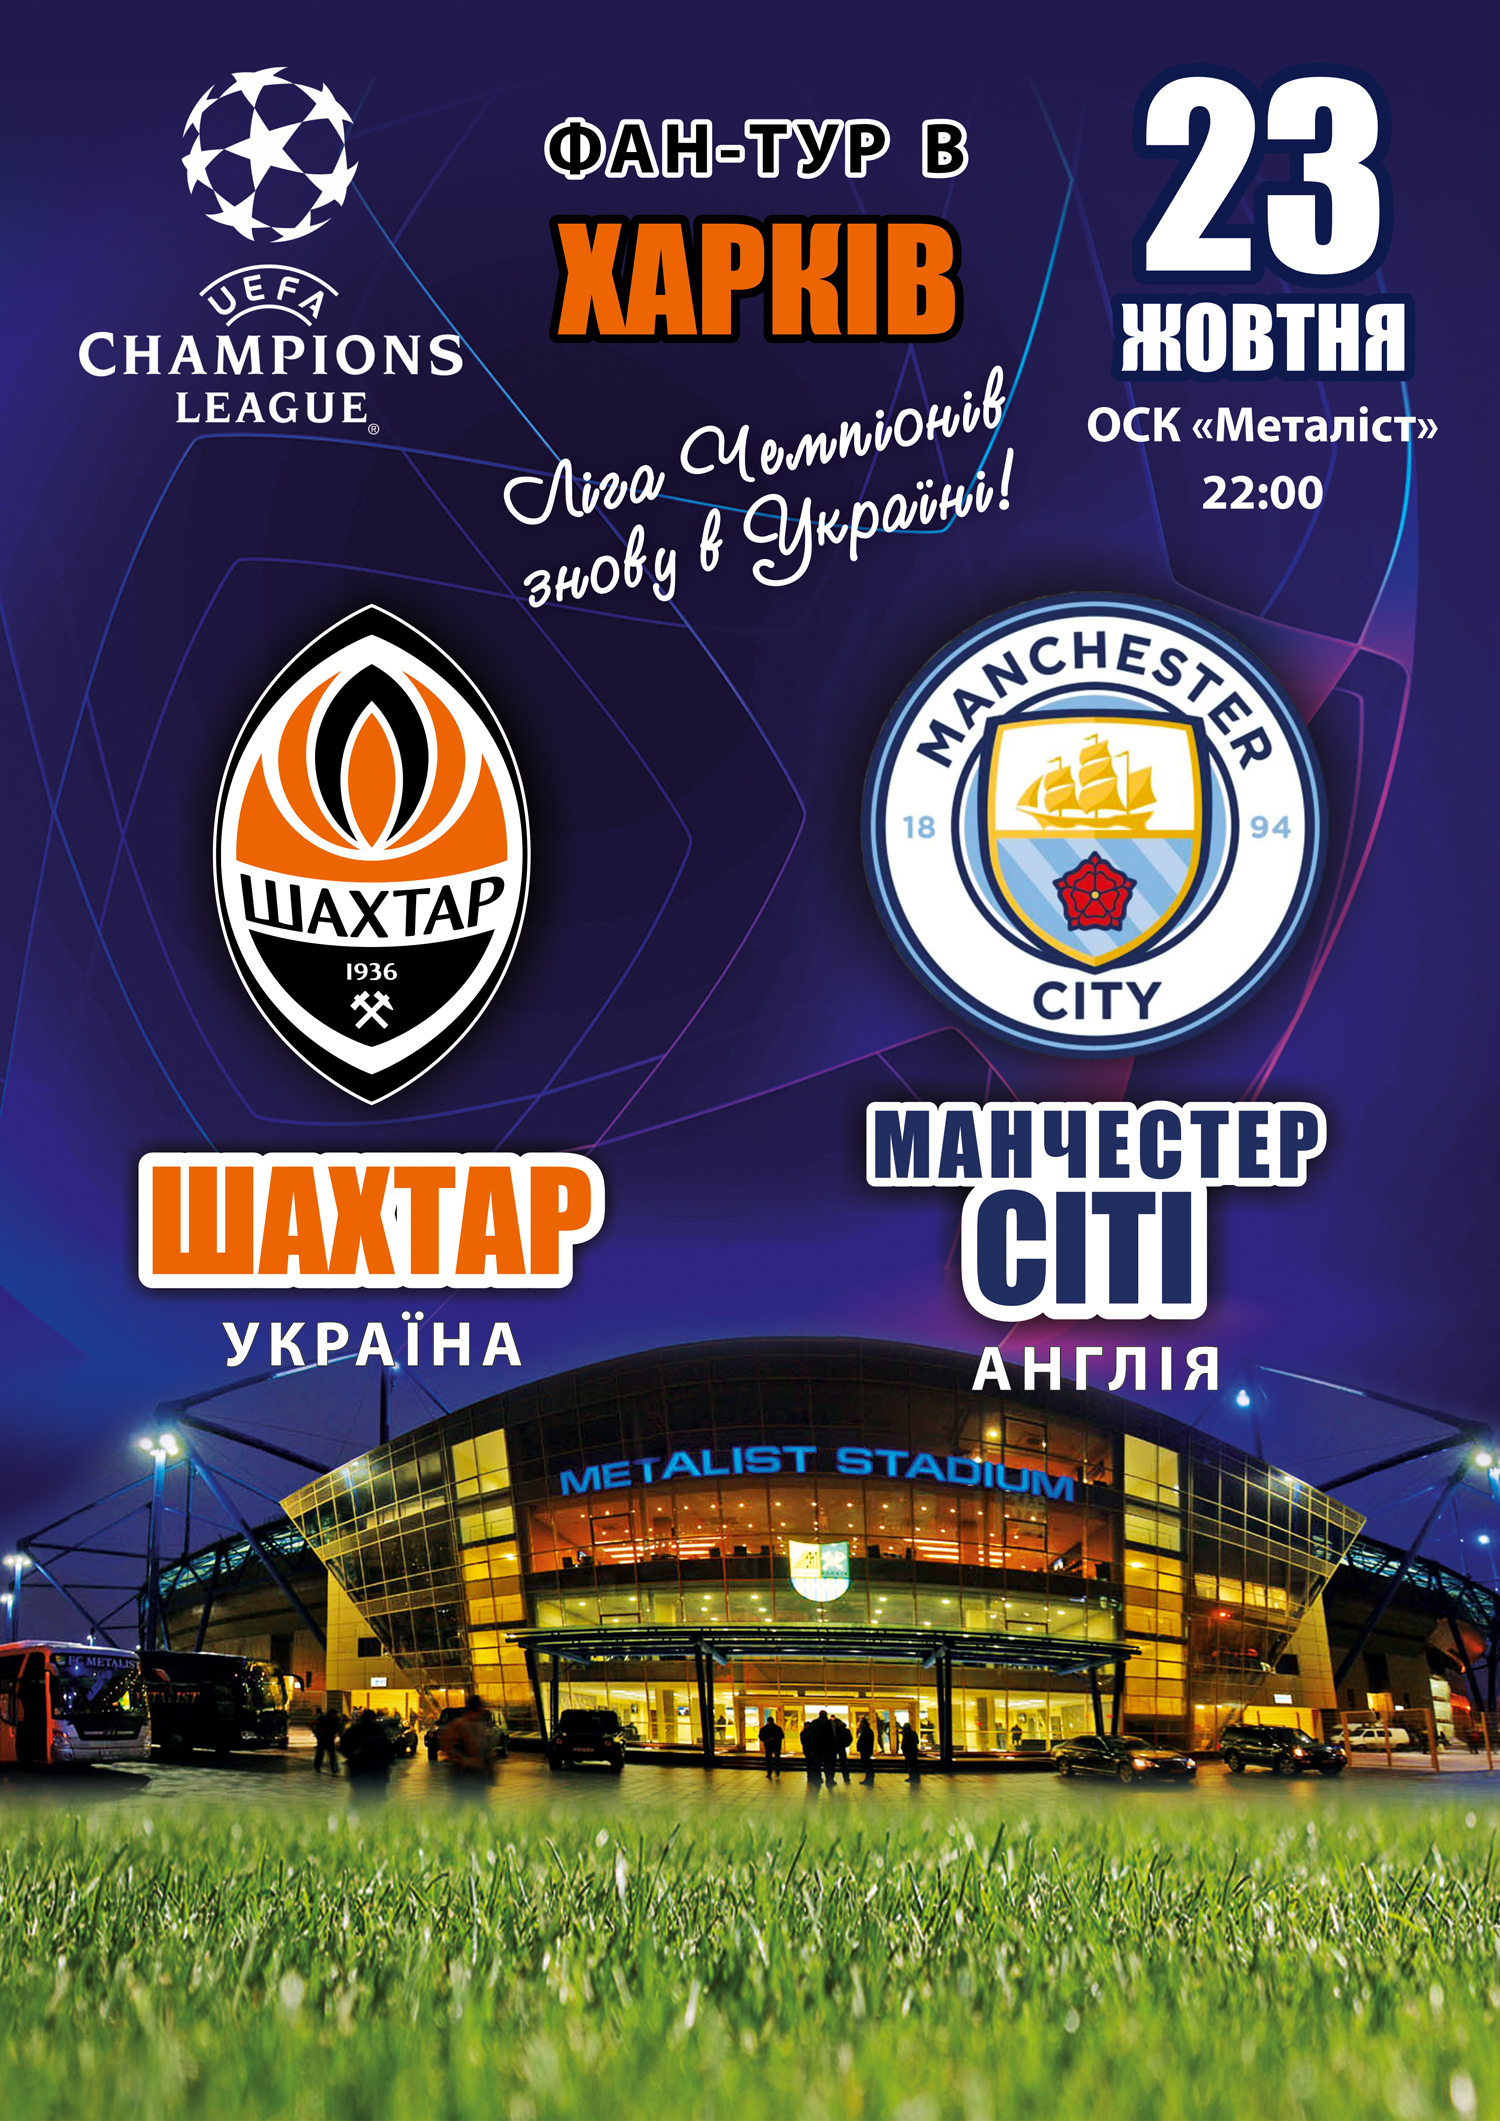 Фан-тур на матч Лиги Чемпионов Шахтер–Манчестер Сити (Хмельницкий)